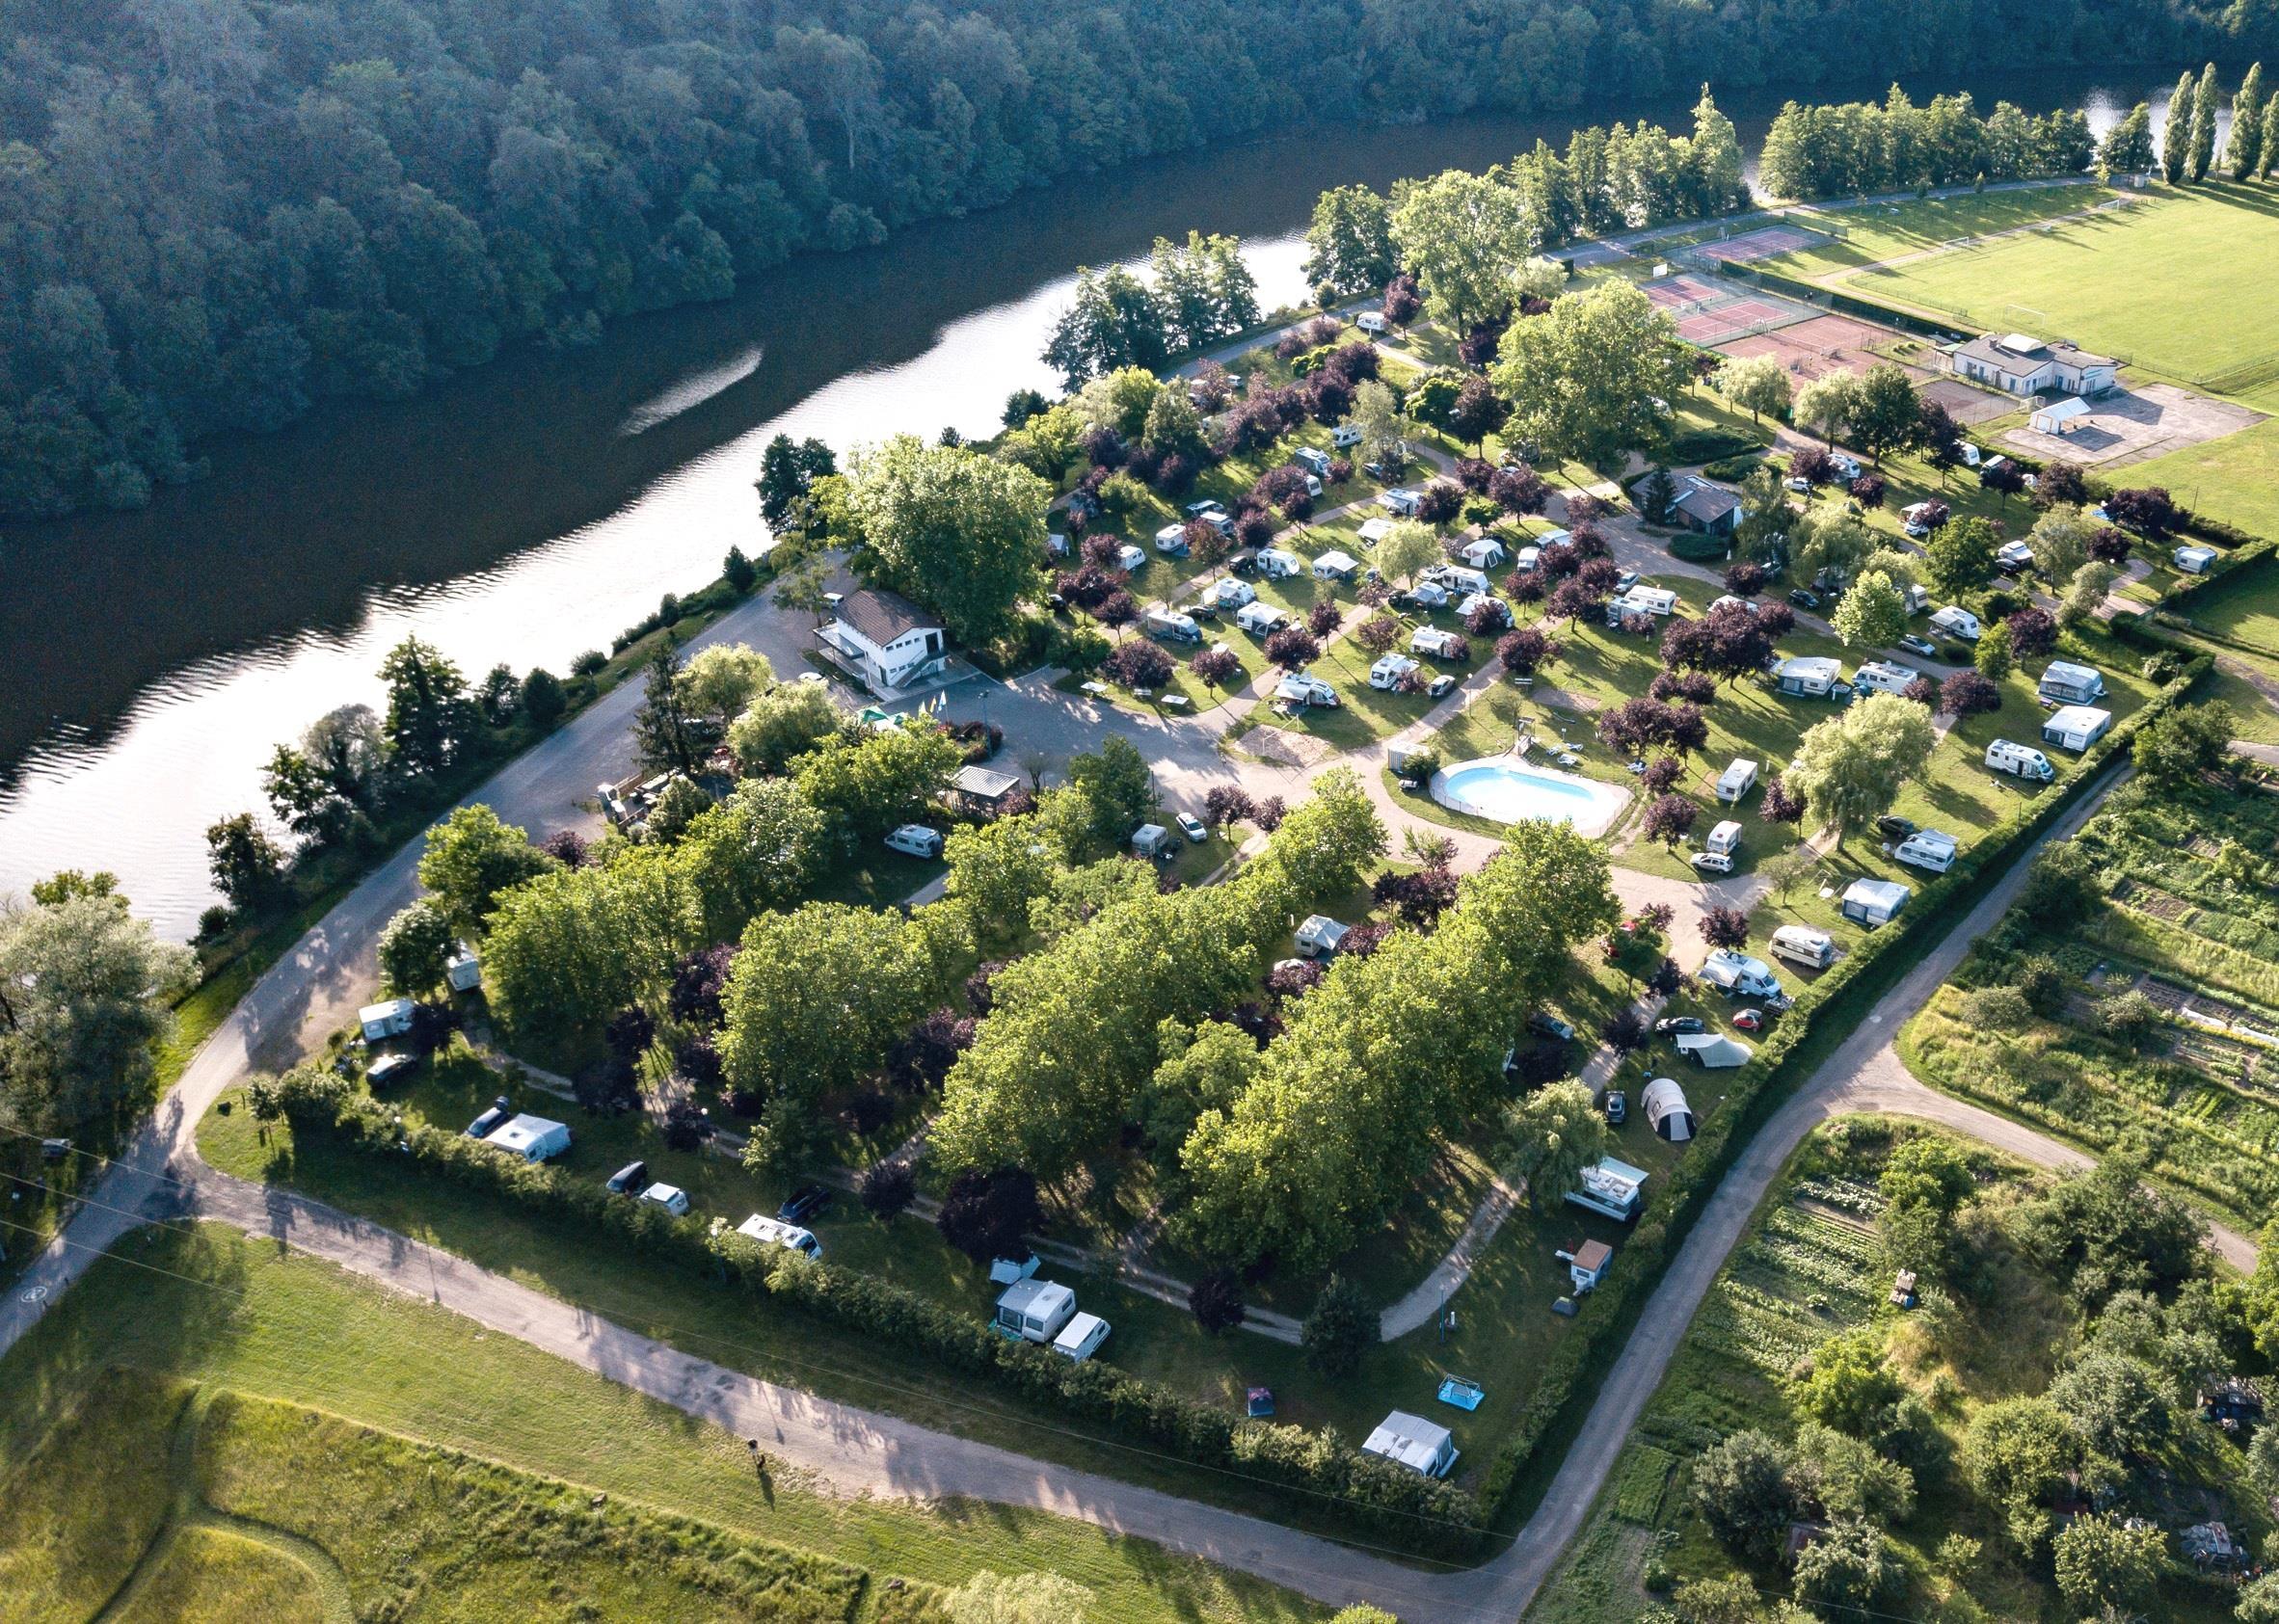 Camping de la Moselle, Liverdun, Meurthe-et-Moselle